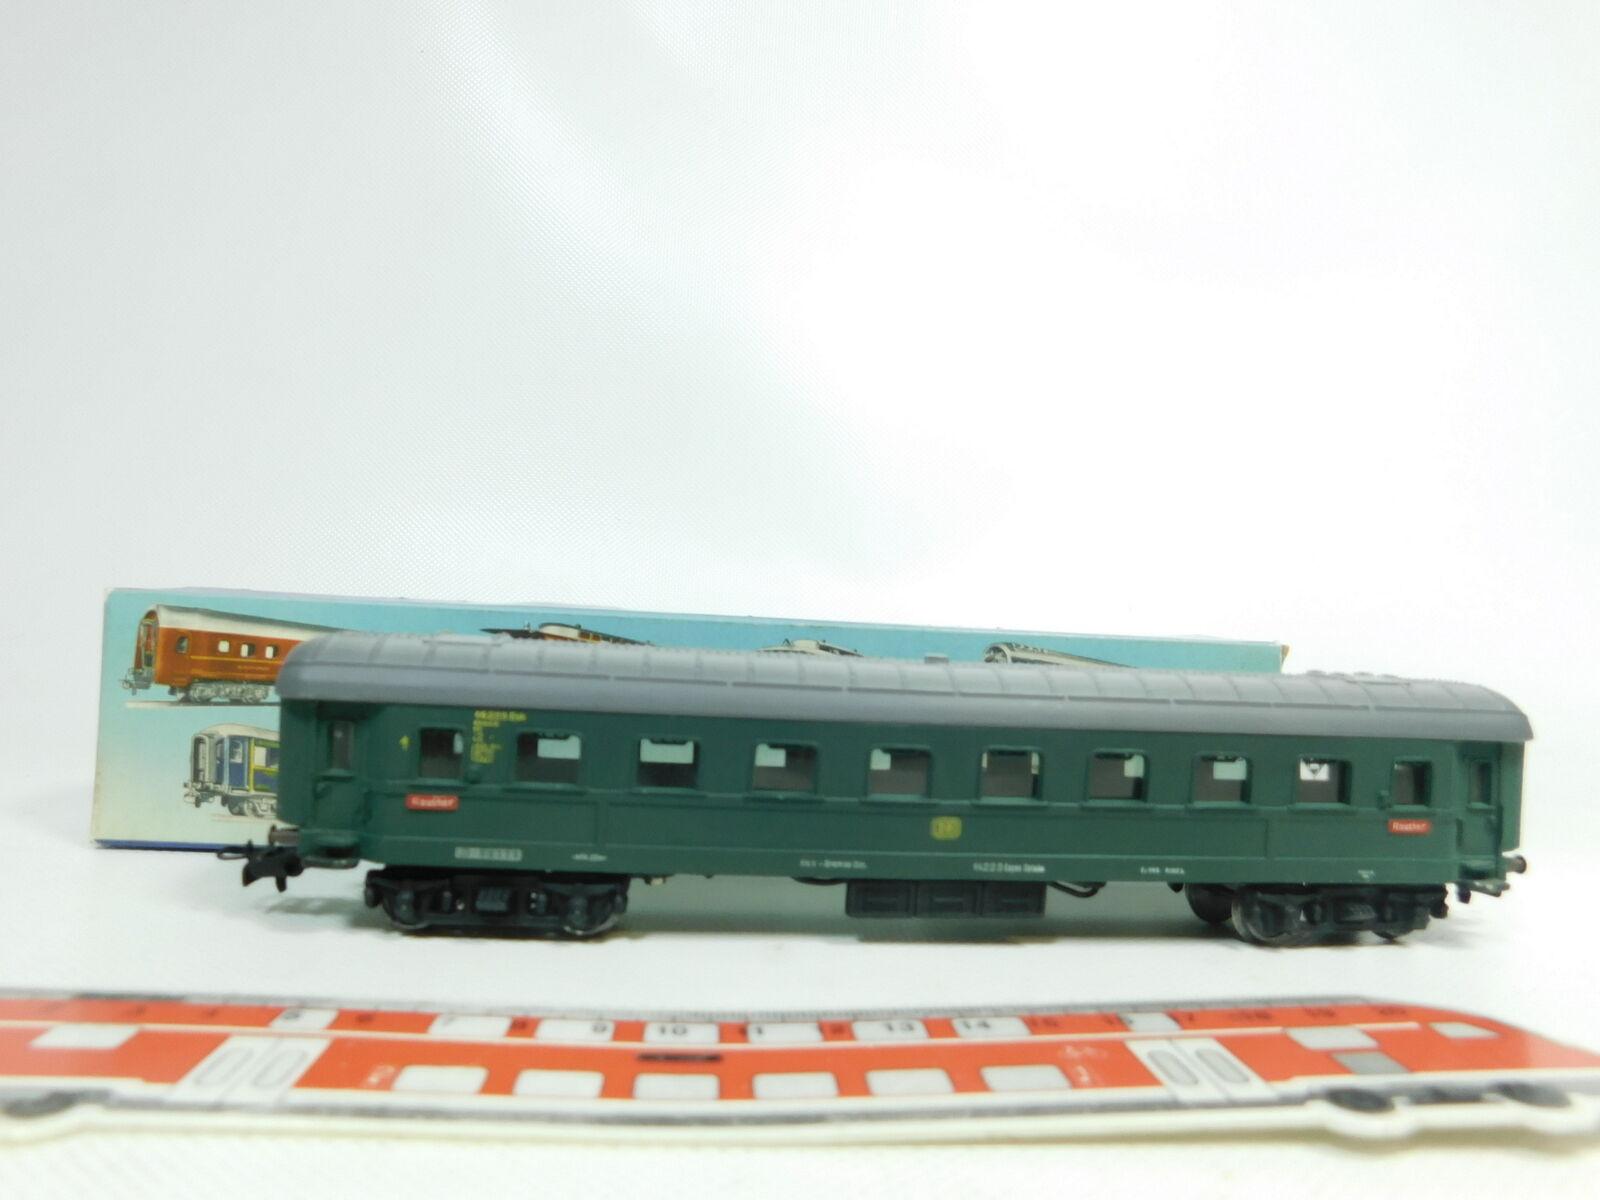 Bj174-0, 5  POCHER h0/ac 202/3 vetture passeggeri 1. classe 14223 ESH Db, Ovp